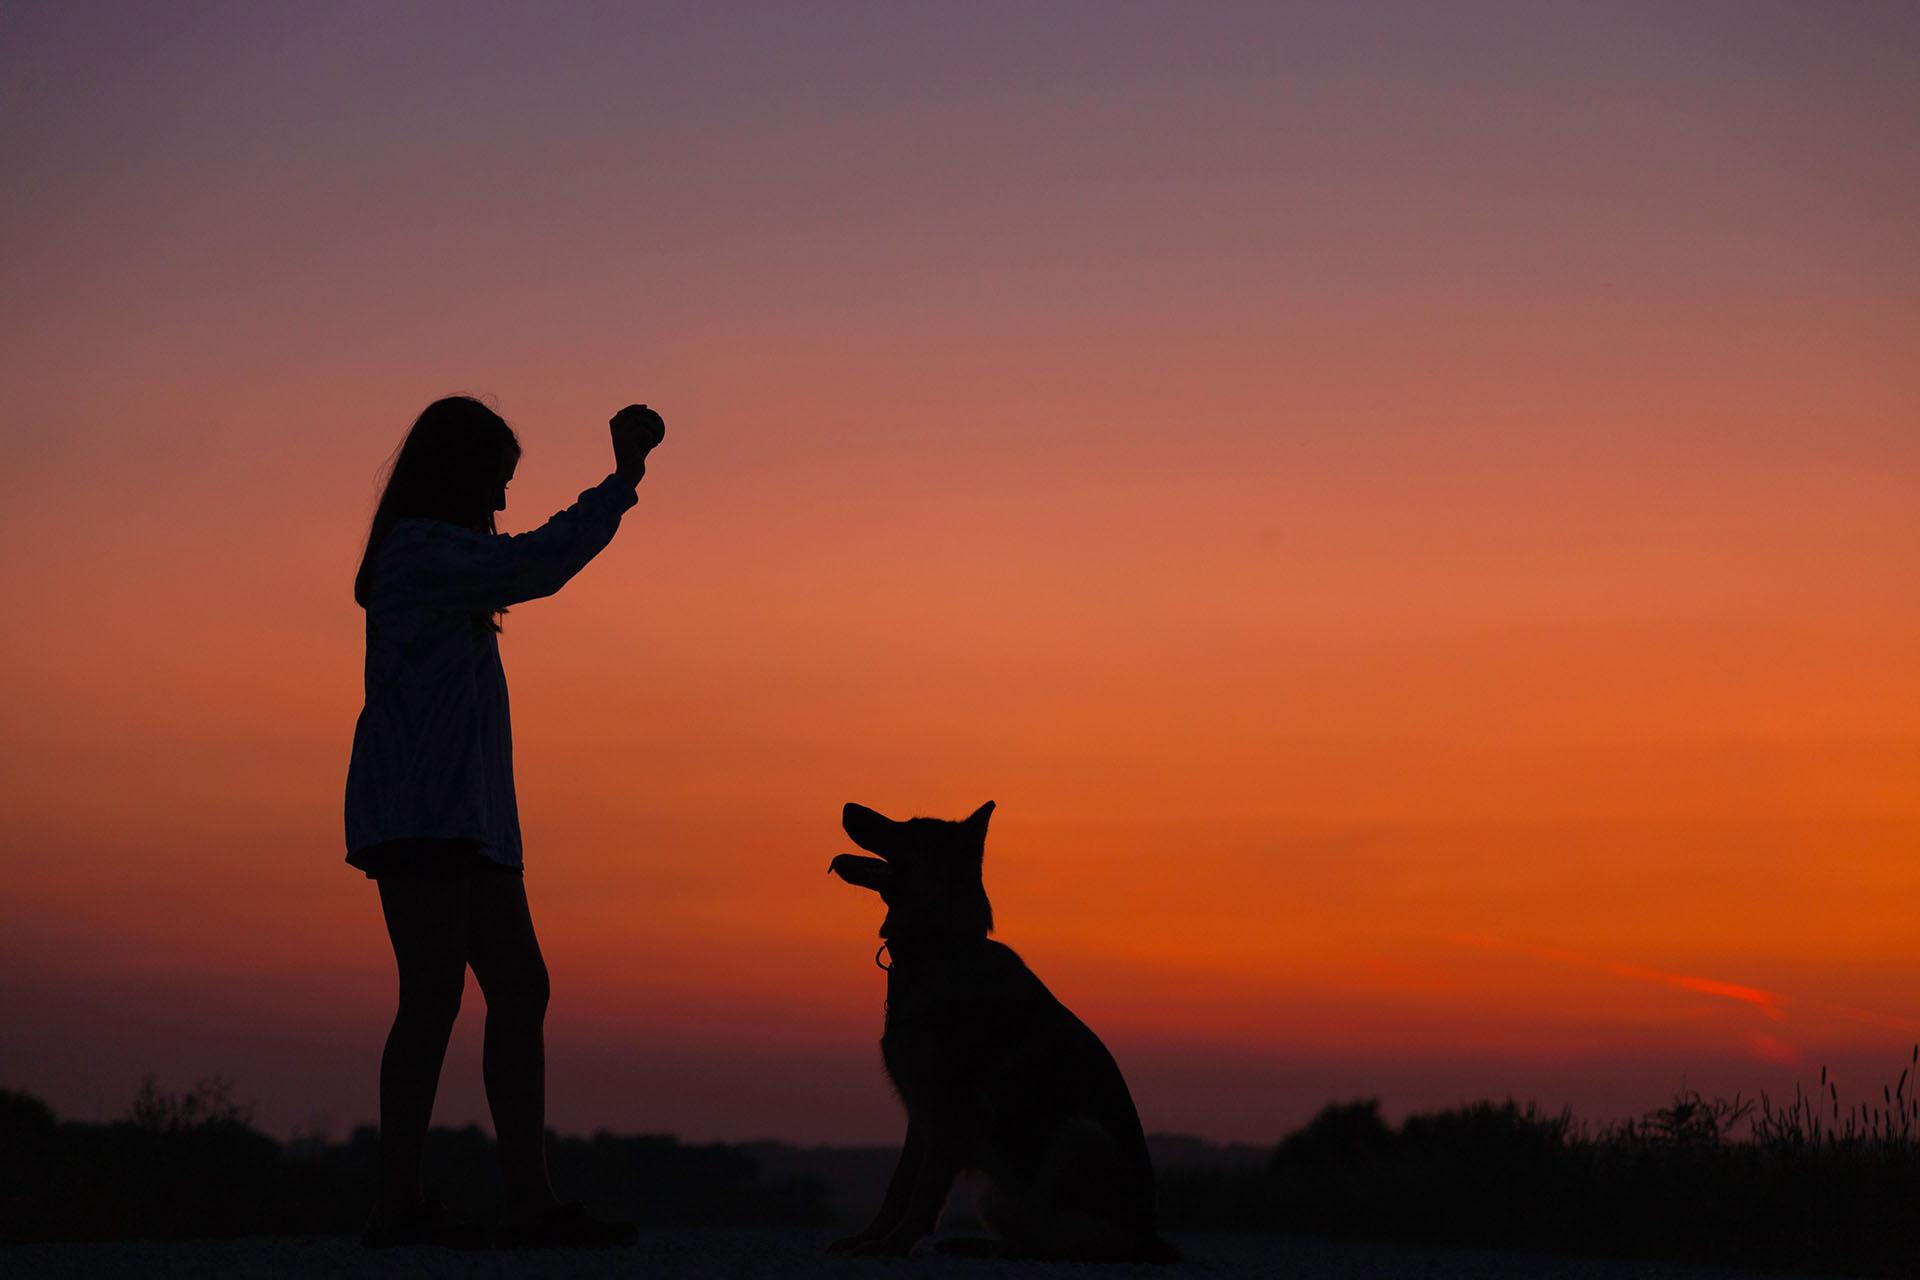 Owner training her dog